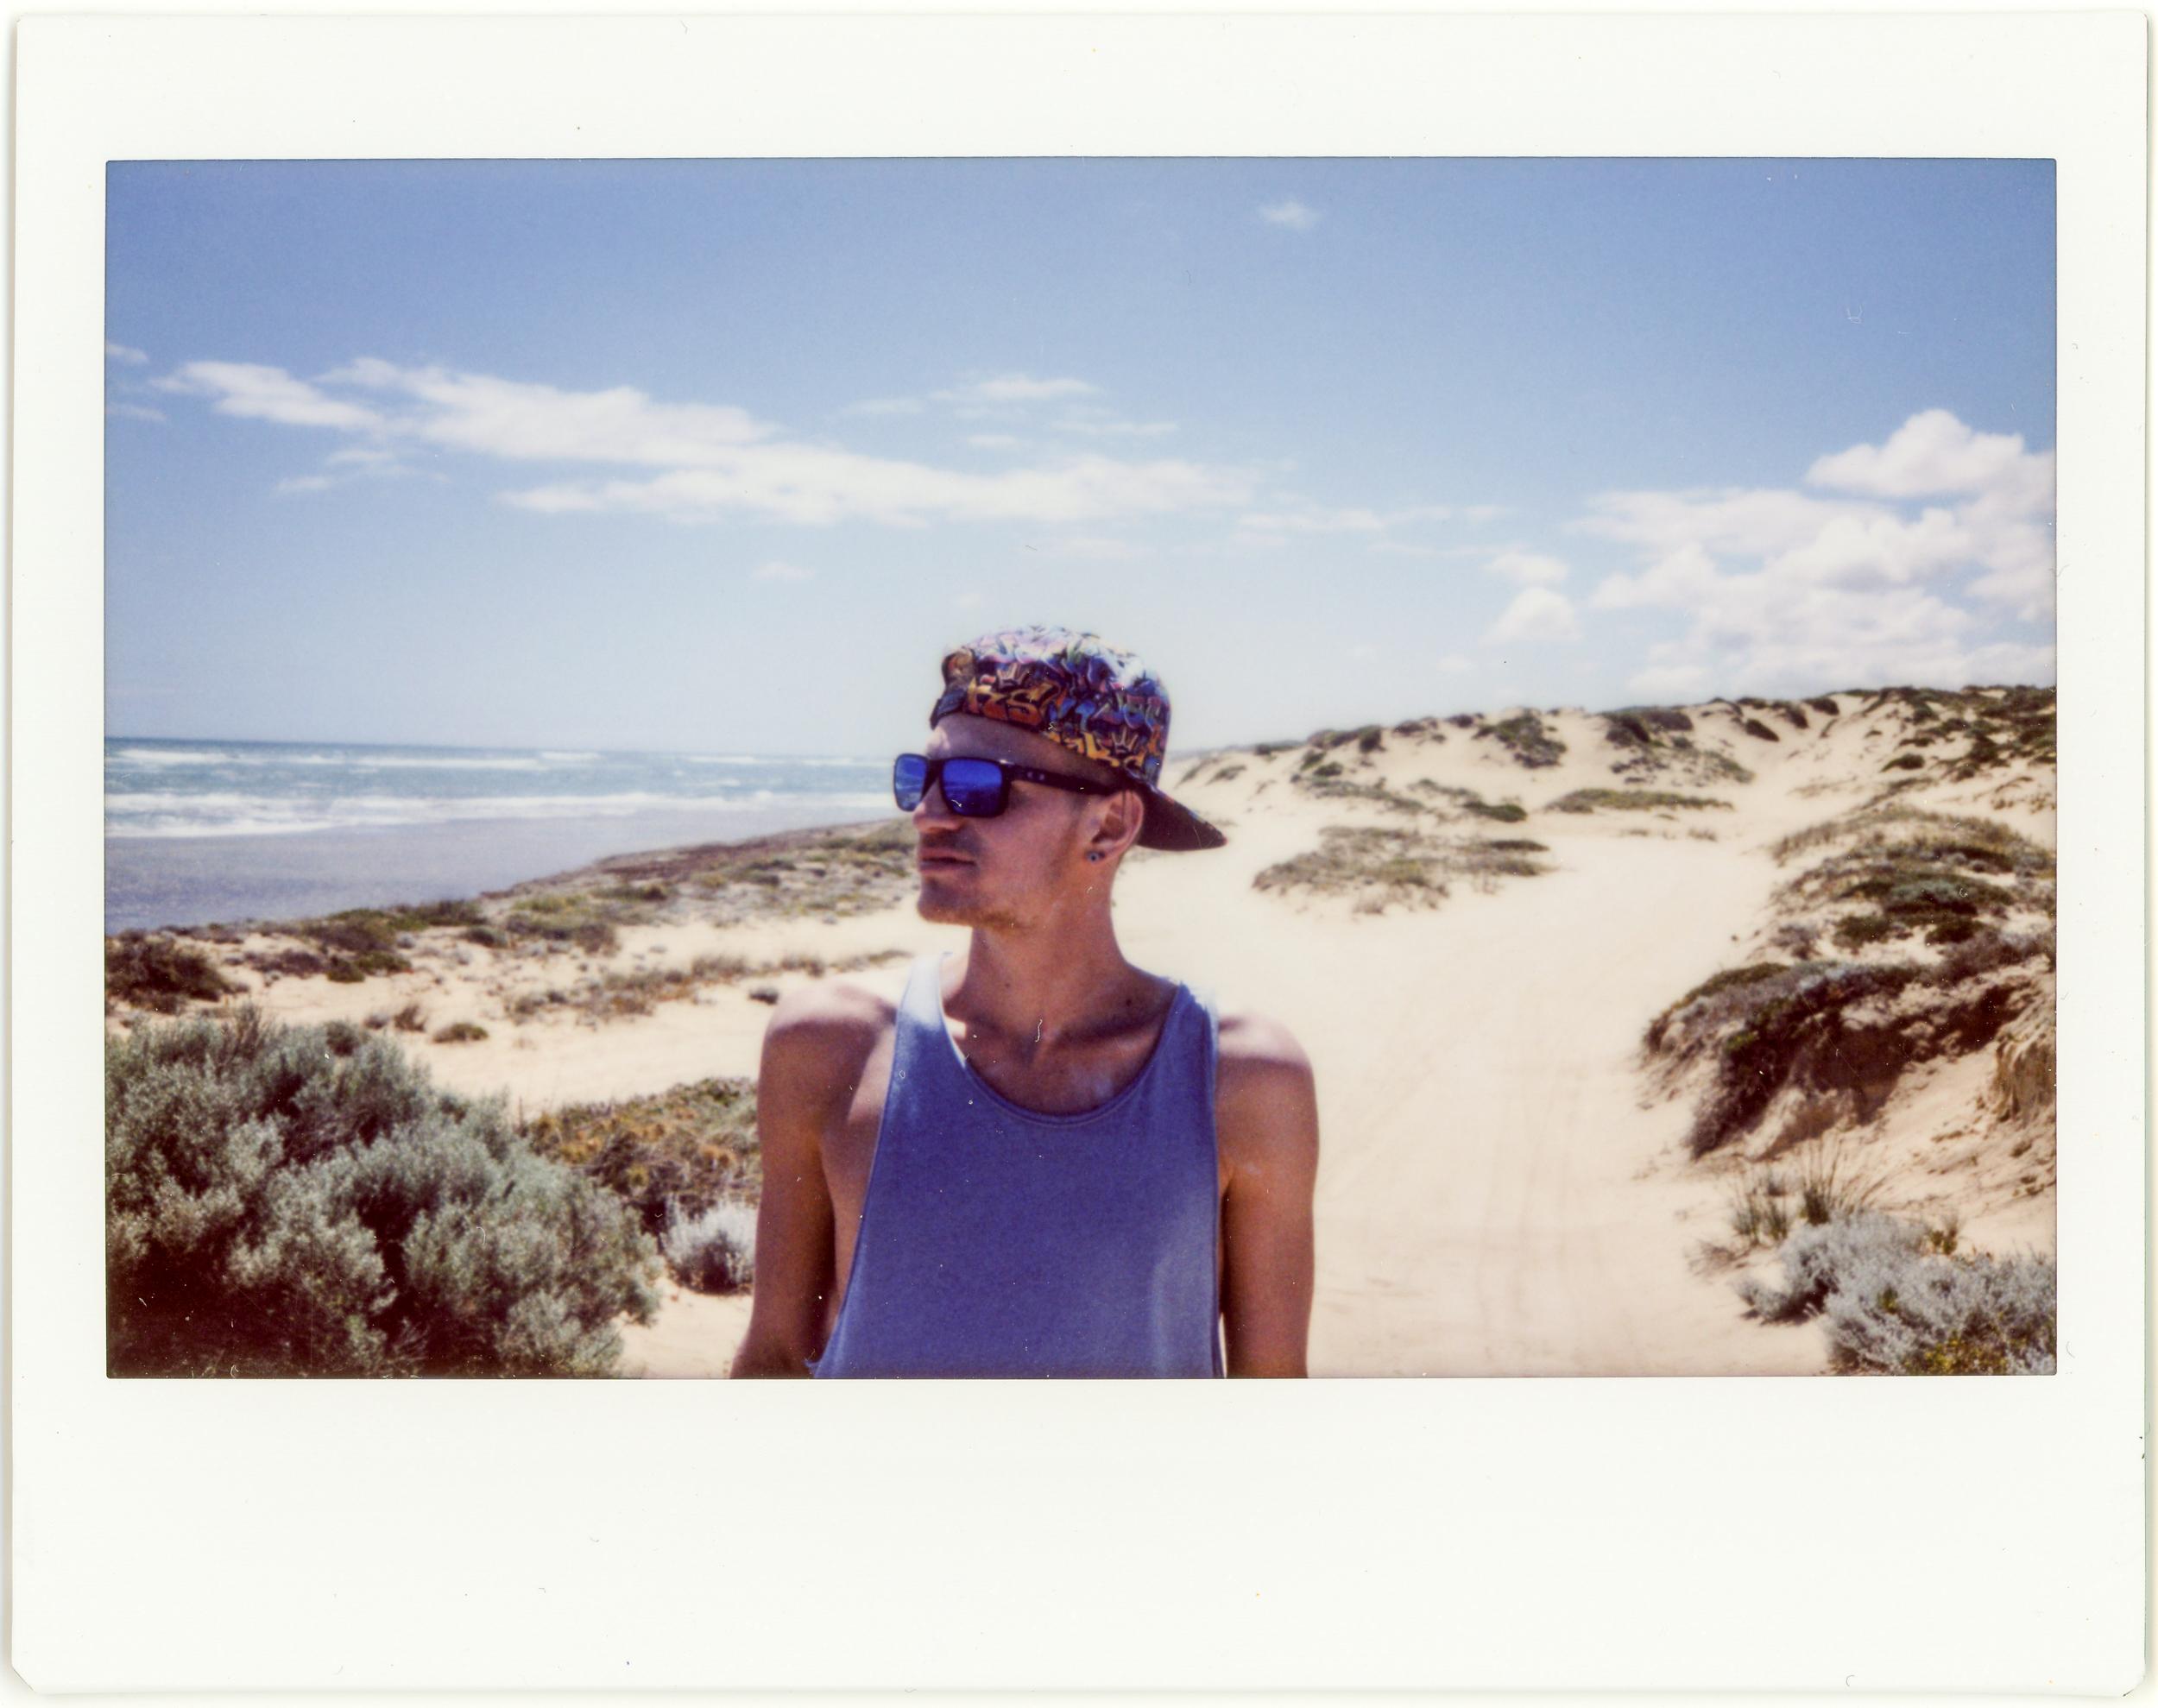 Australien_Instax1.jpg